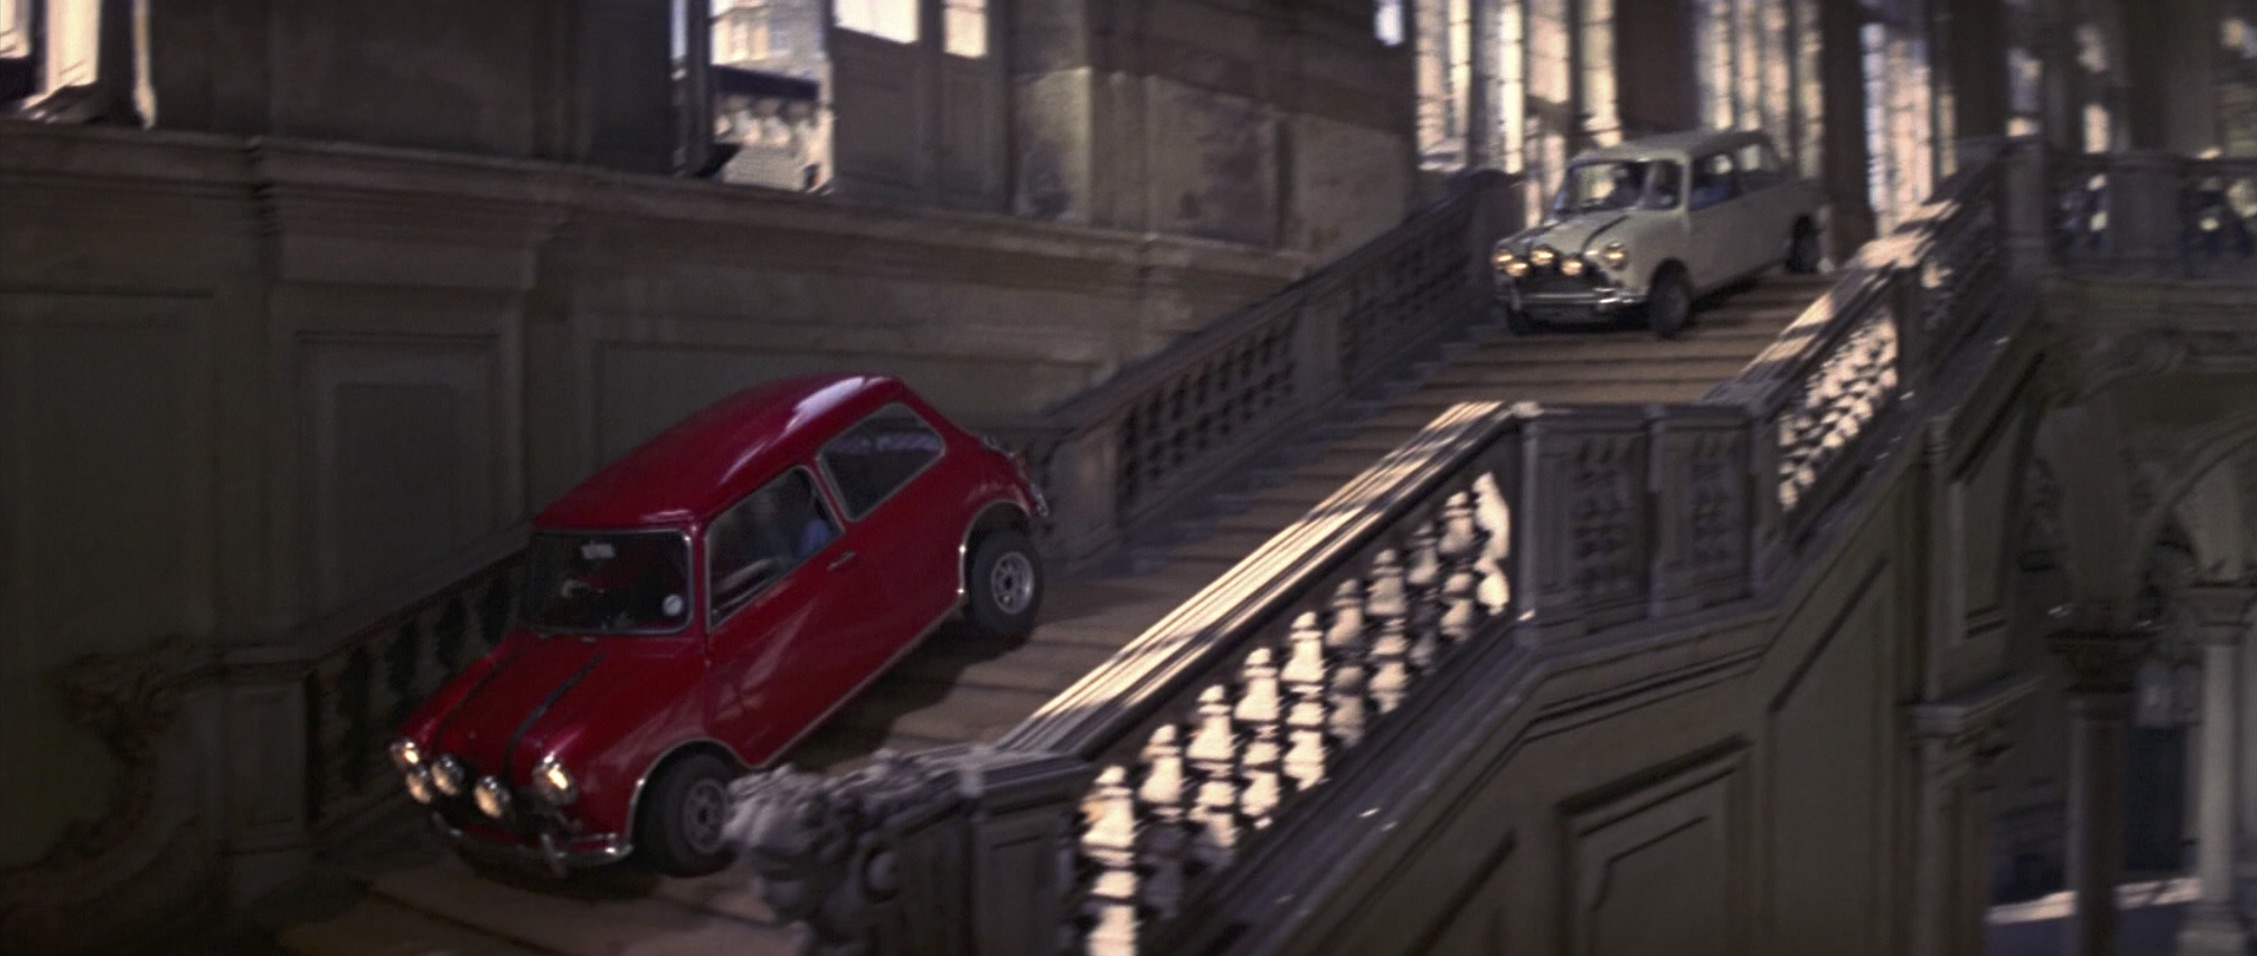 The Italian Job 1969 chase scene